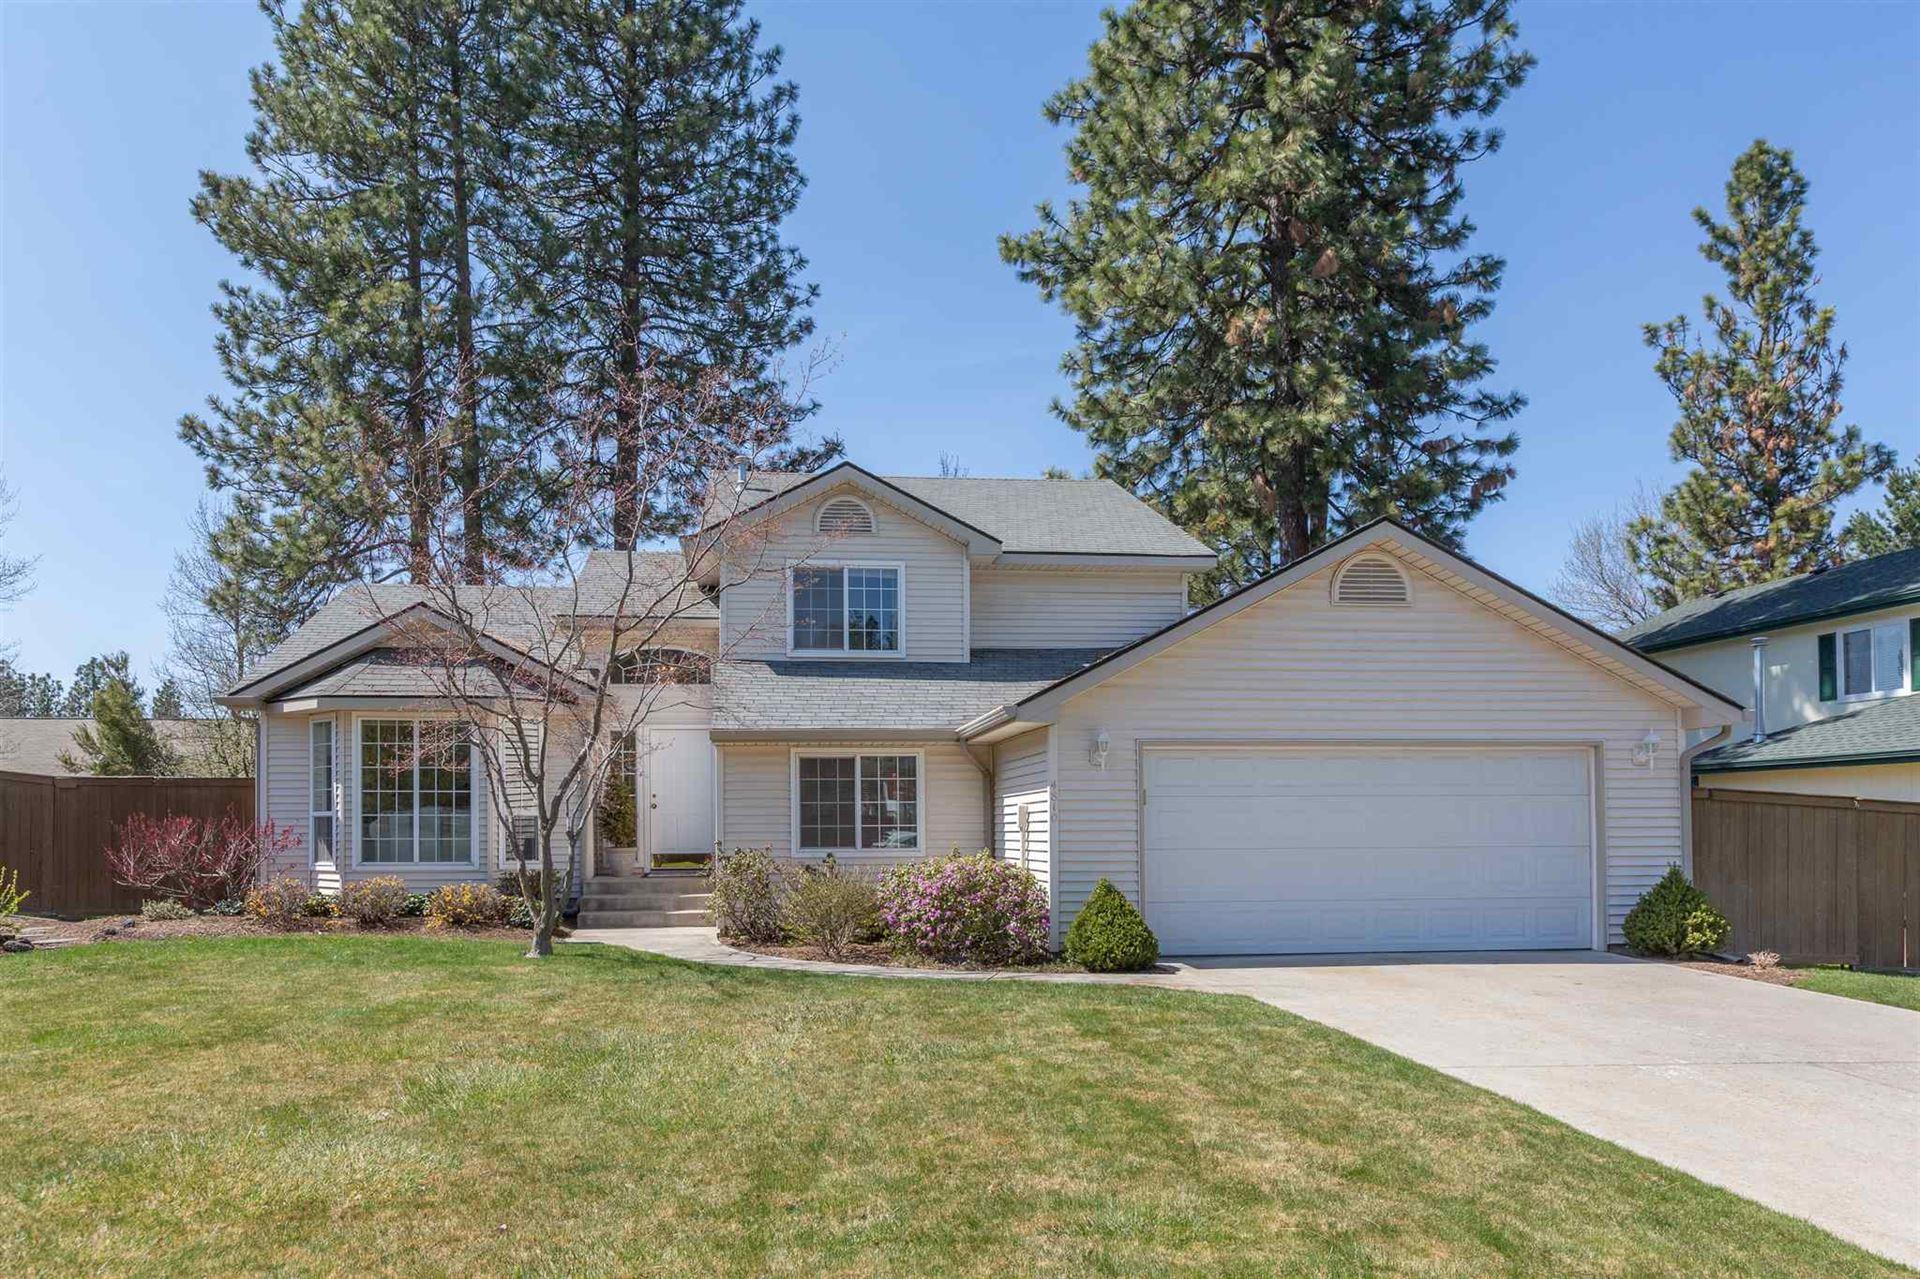 4810 S Thor St, Spokane, WA 99223 - #: 202114356